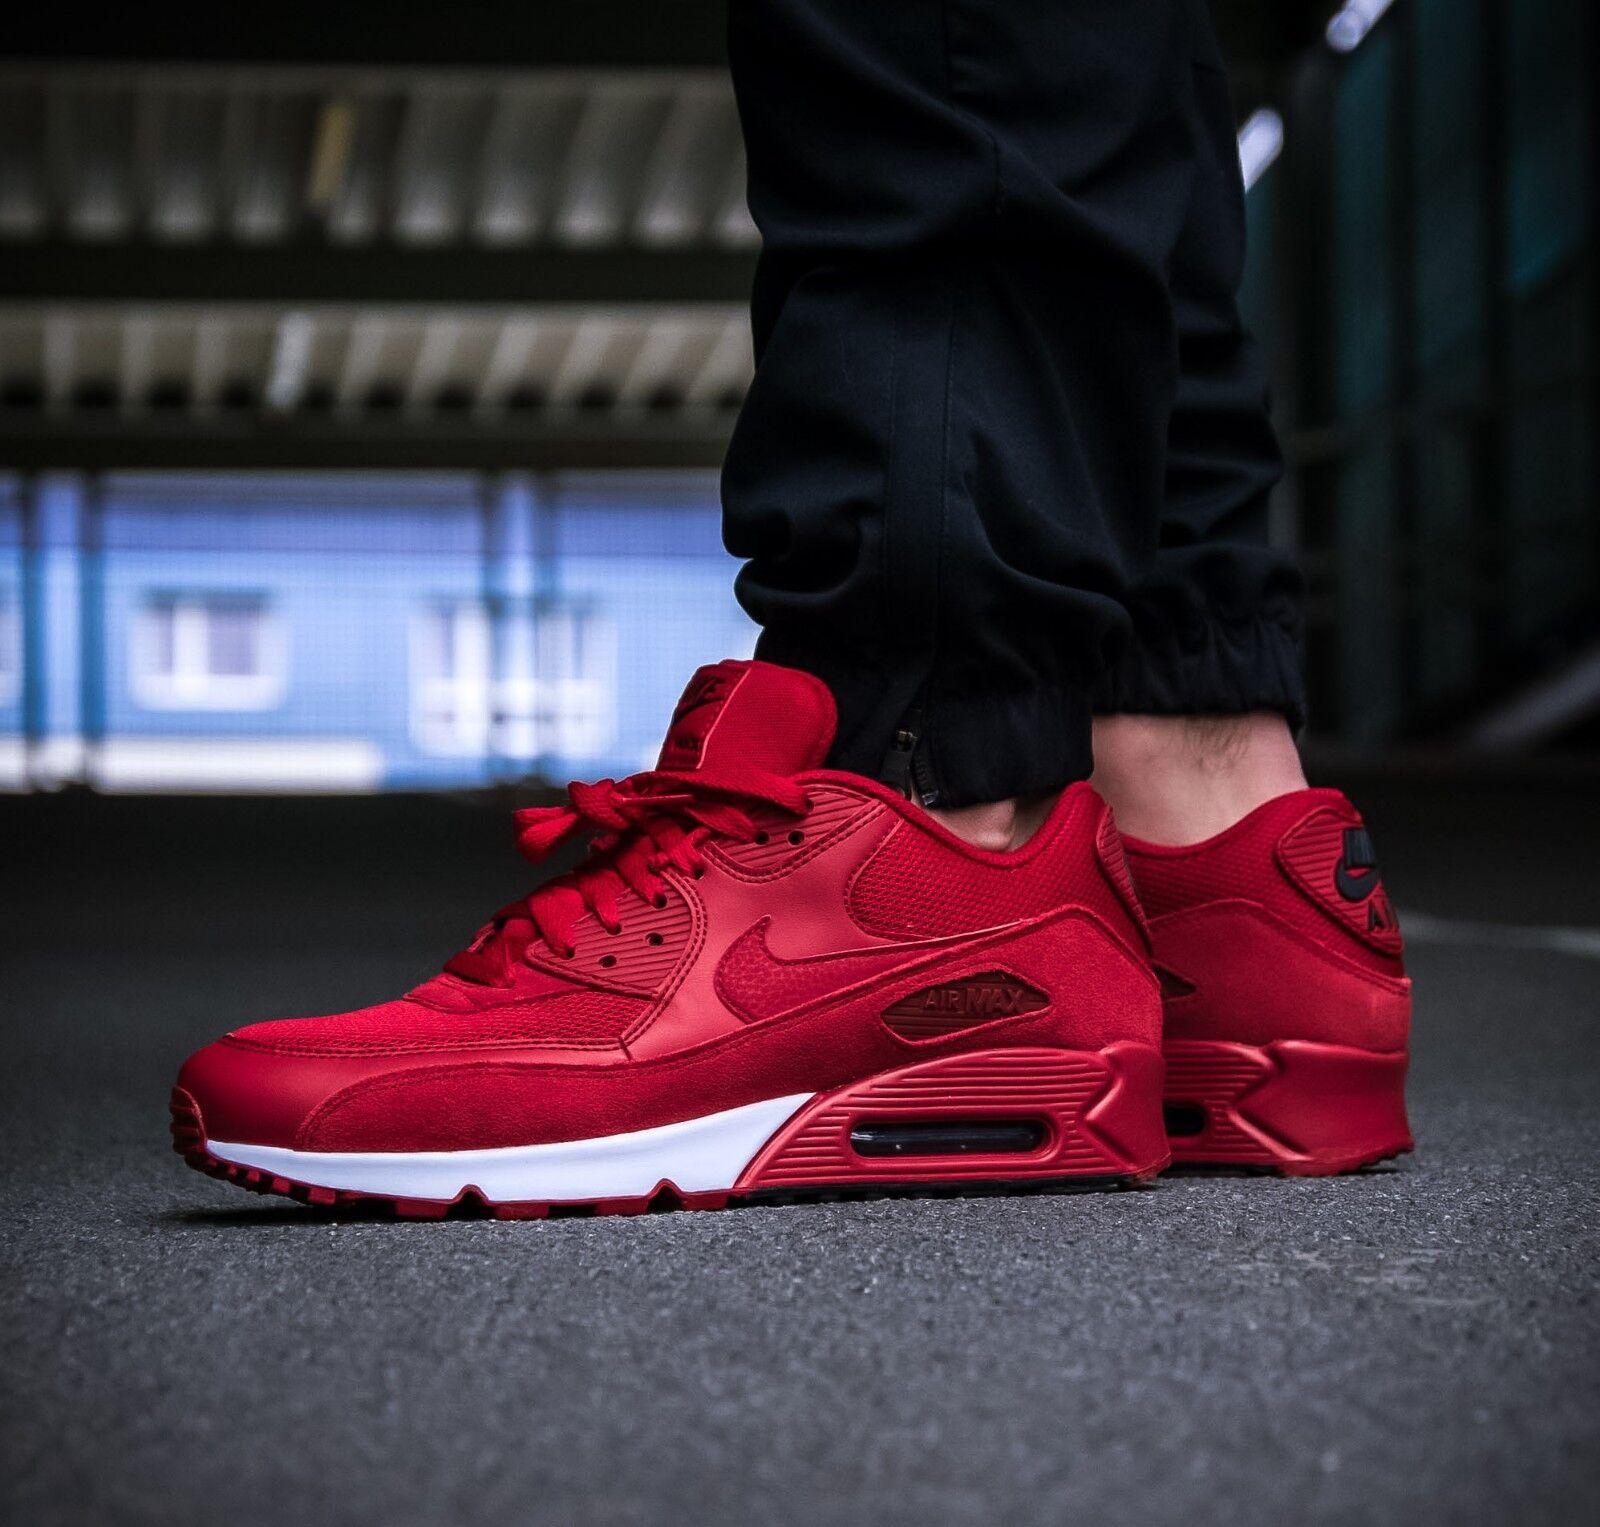 Mens Nike Air Max 90 Essential Sneakers New Gym Red   Black 537384-604